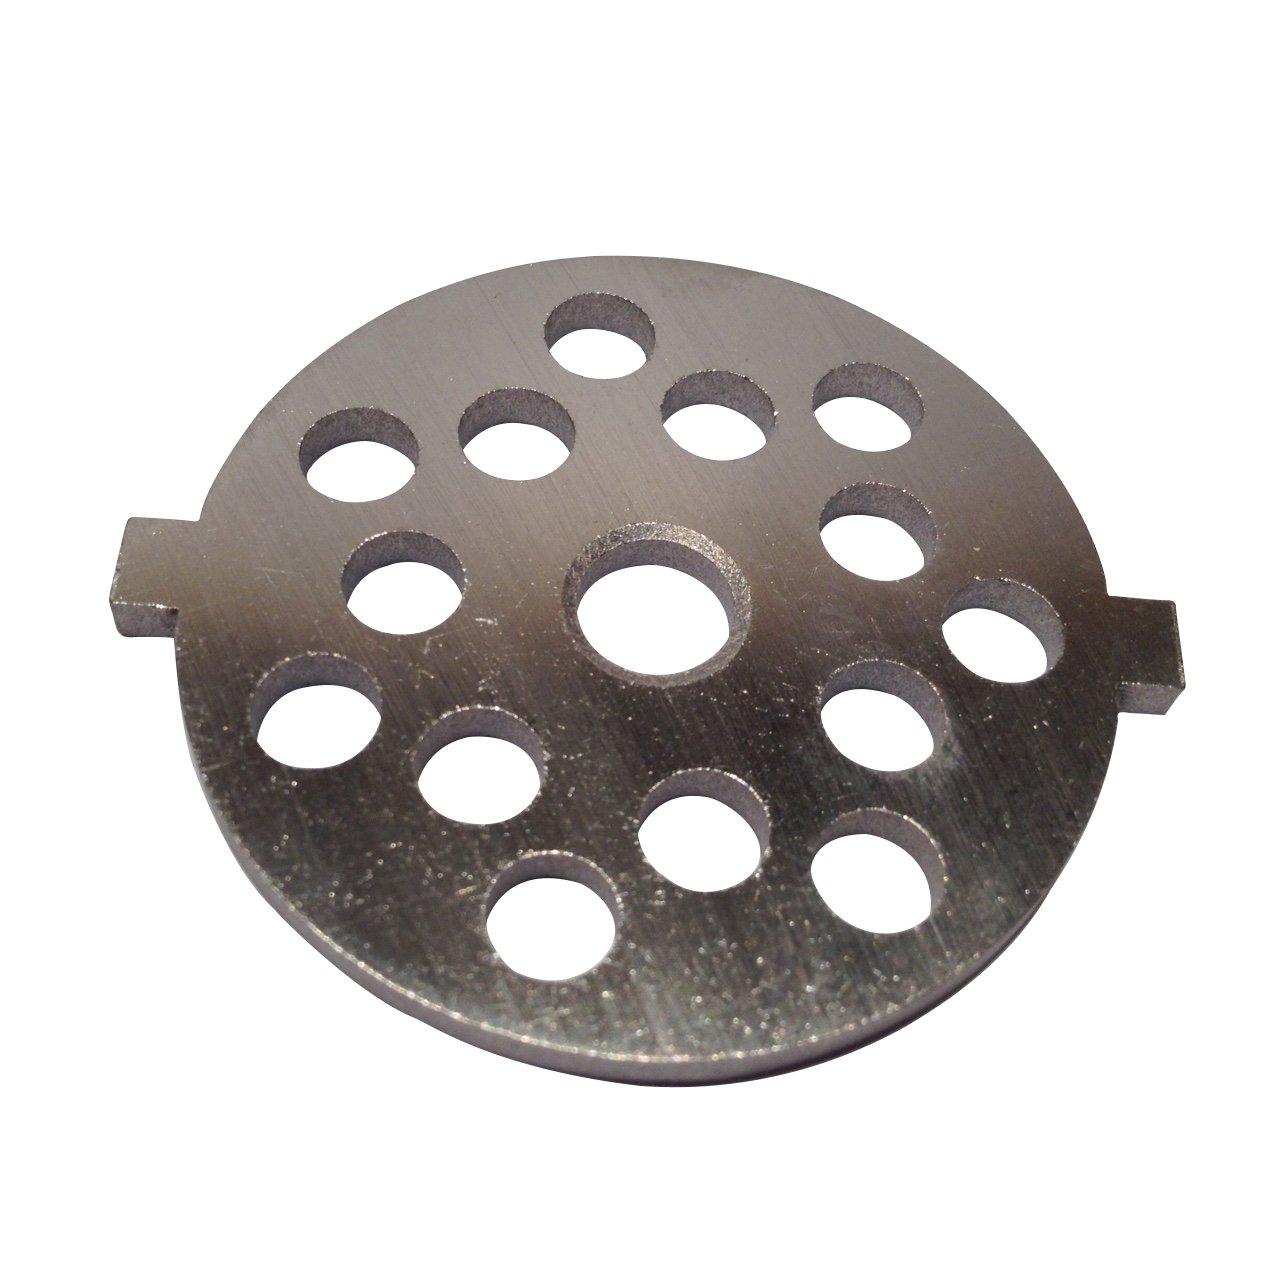 Kitchenaid FGA Food Grinder / Mincer Coarse Grinding Plate 9709030